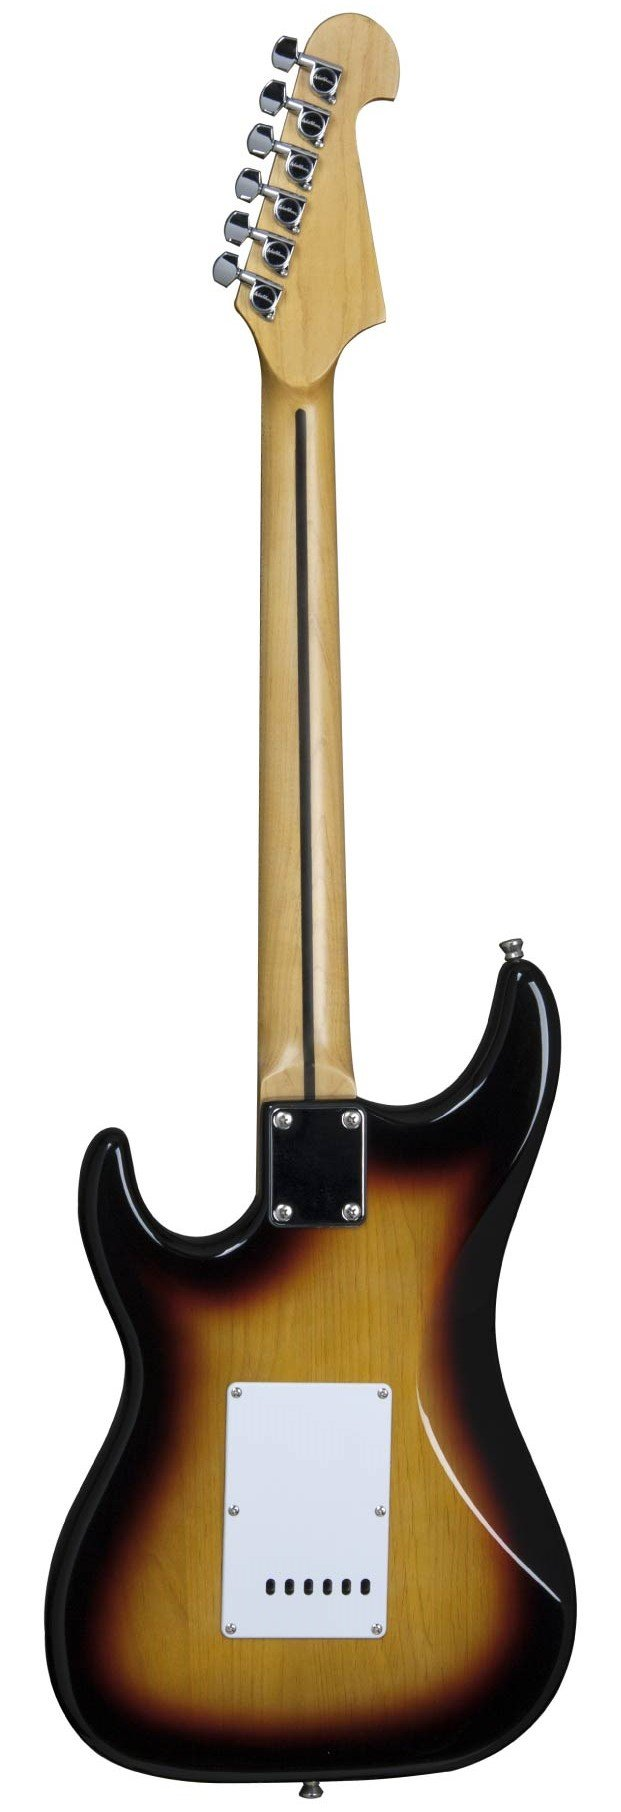 Guitarra Washburn S1TS tobacco, Capta S/S/S headstock inver.